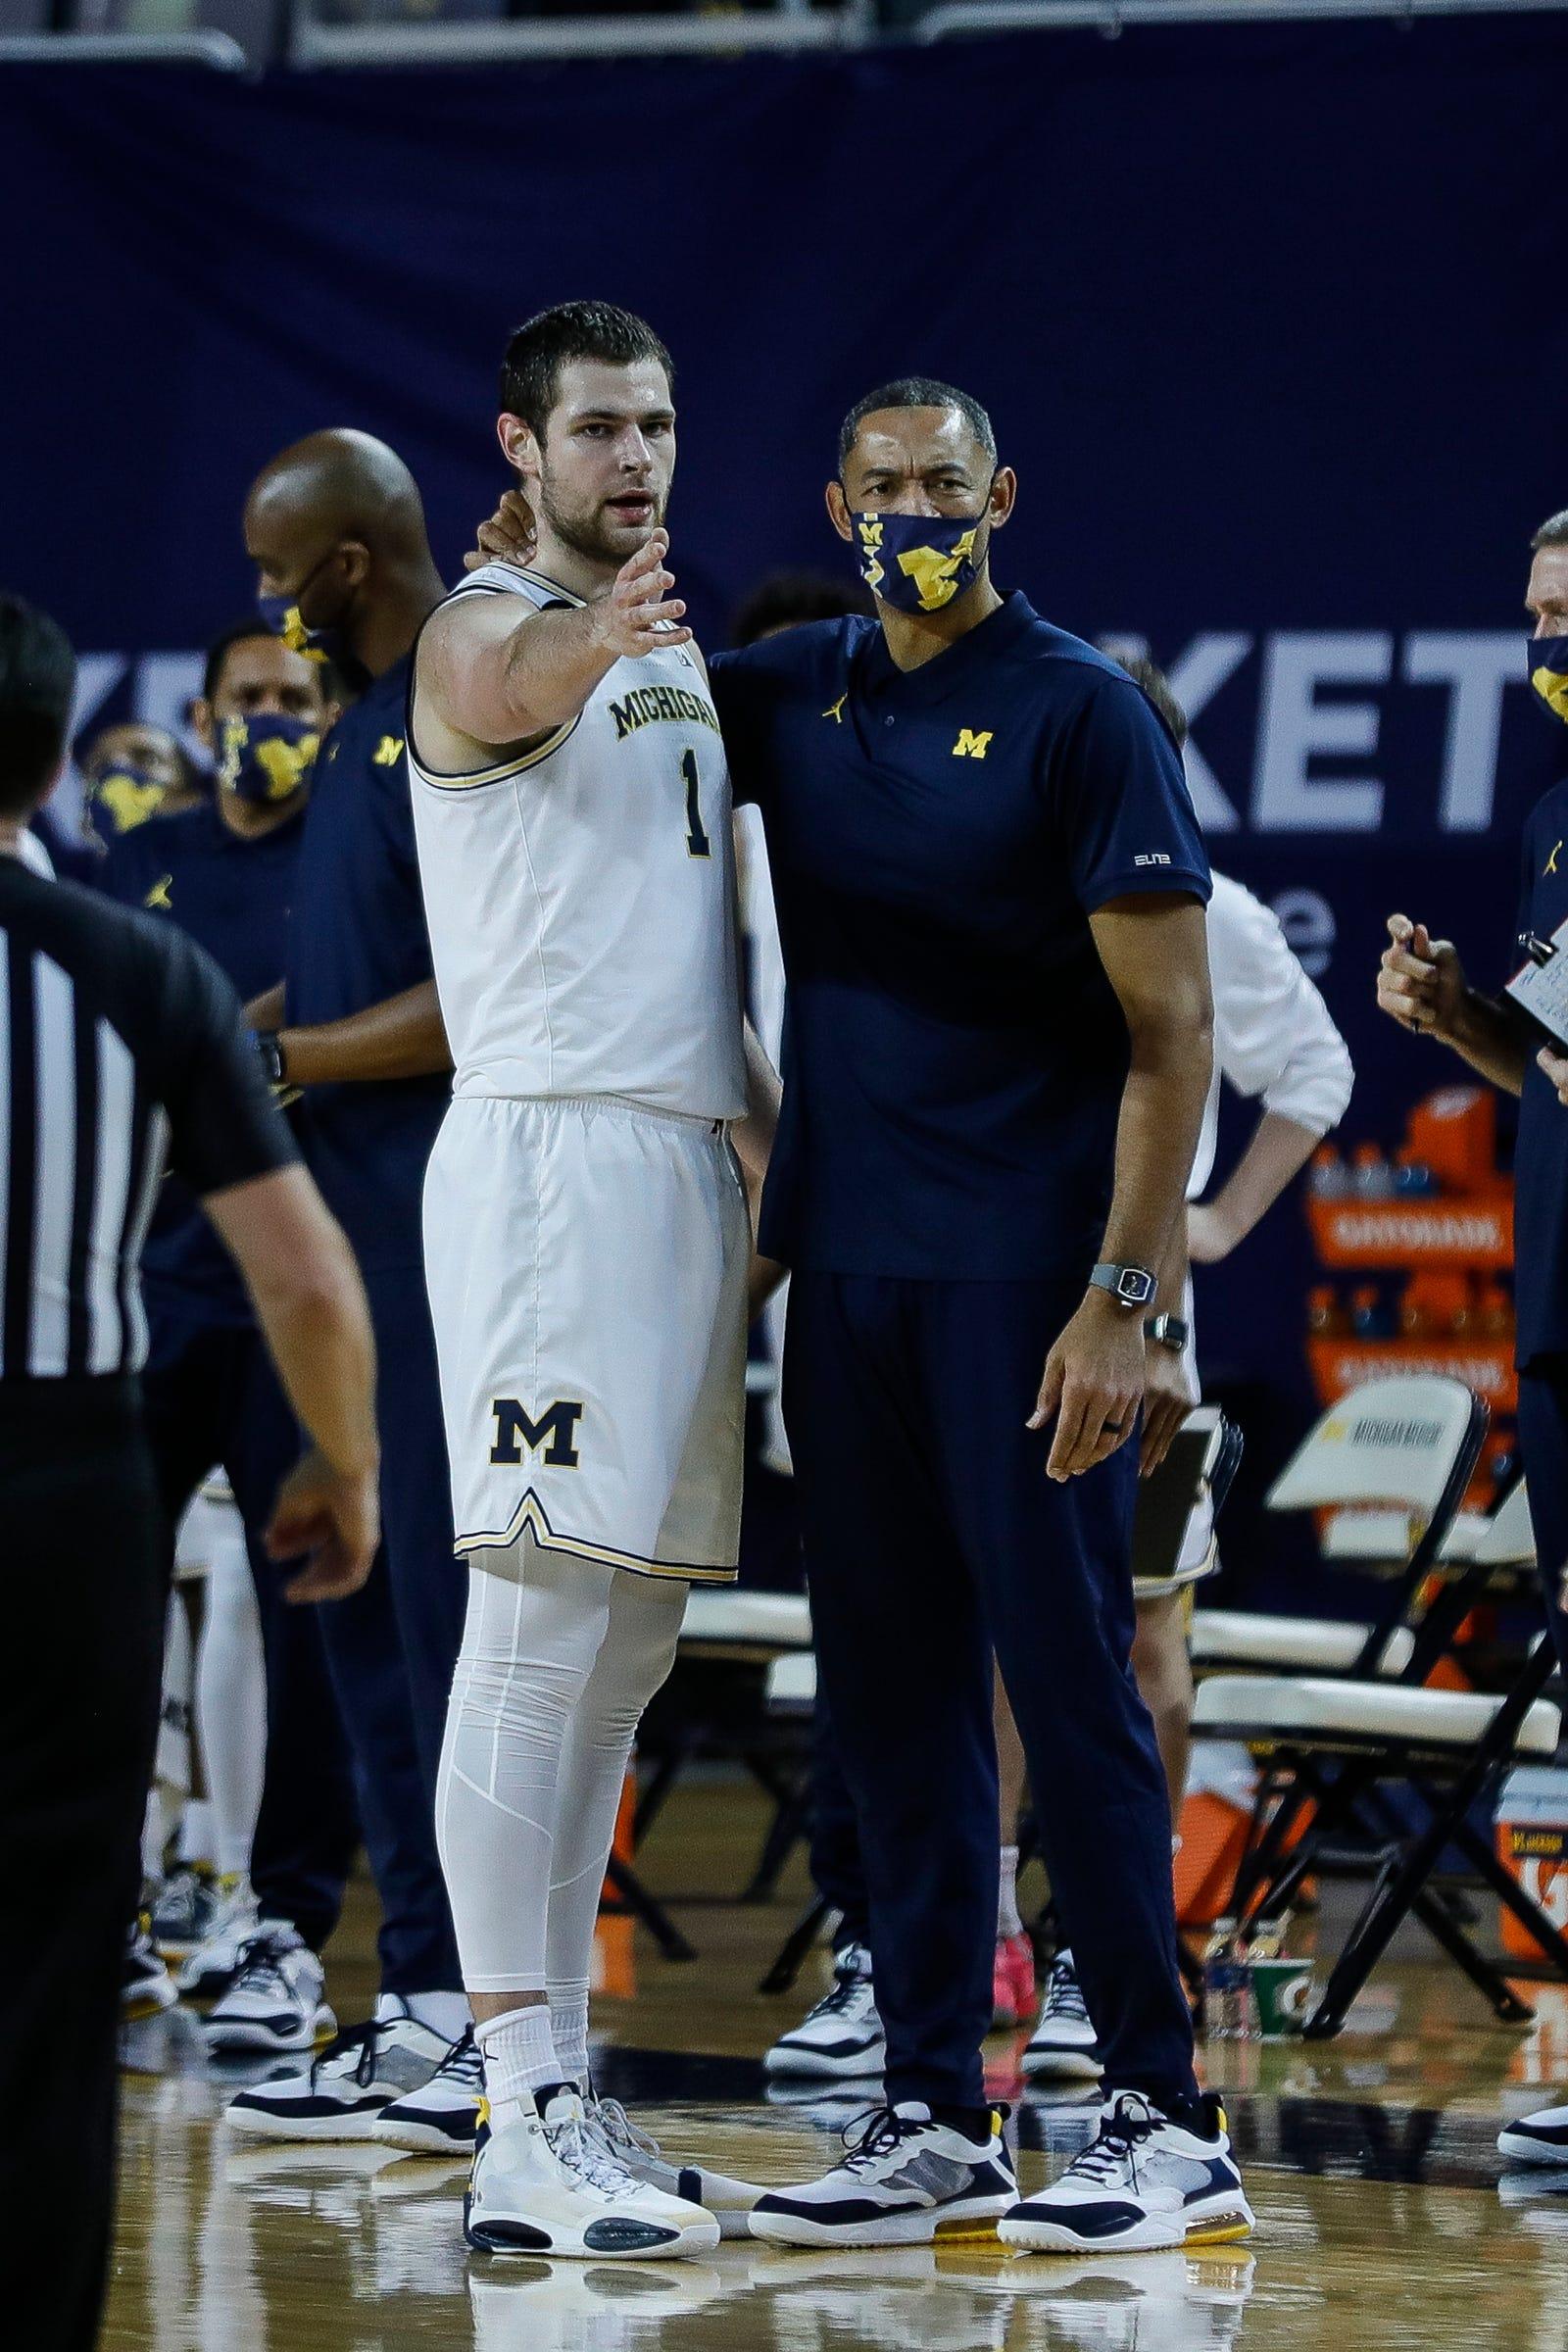 Why Michigan basketball's Hunter Dickinson struggled in rematch vs. Minnesota